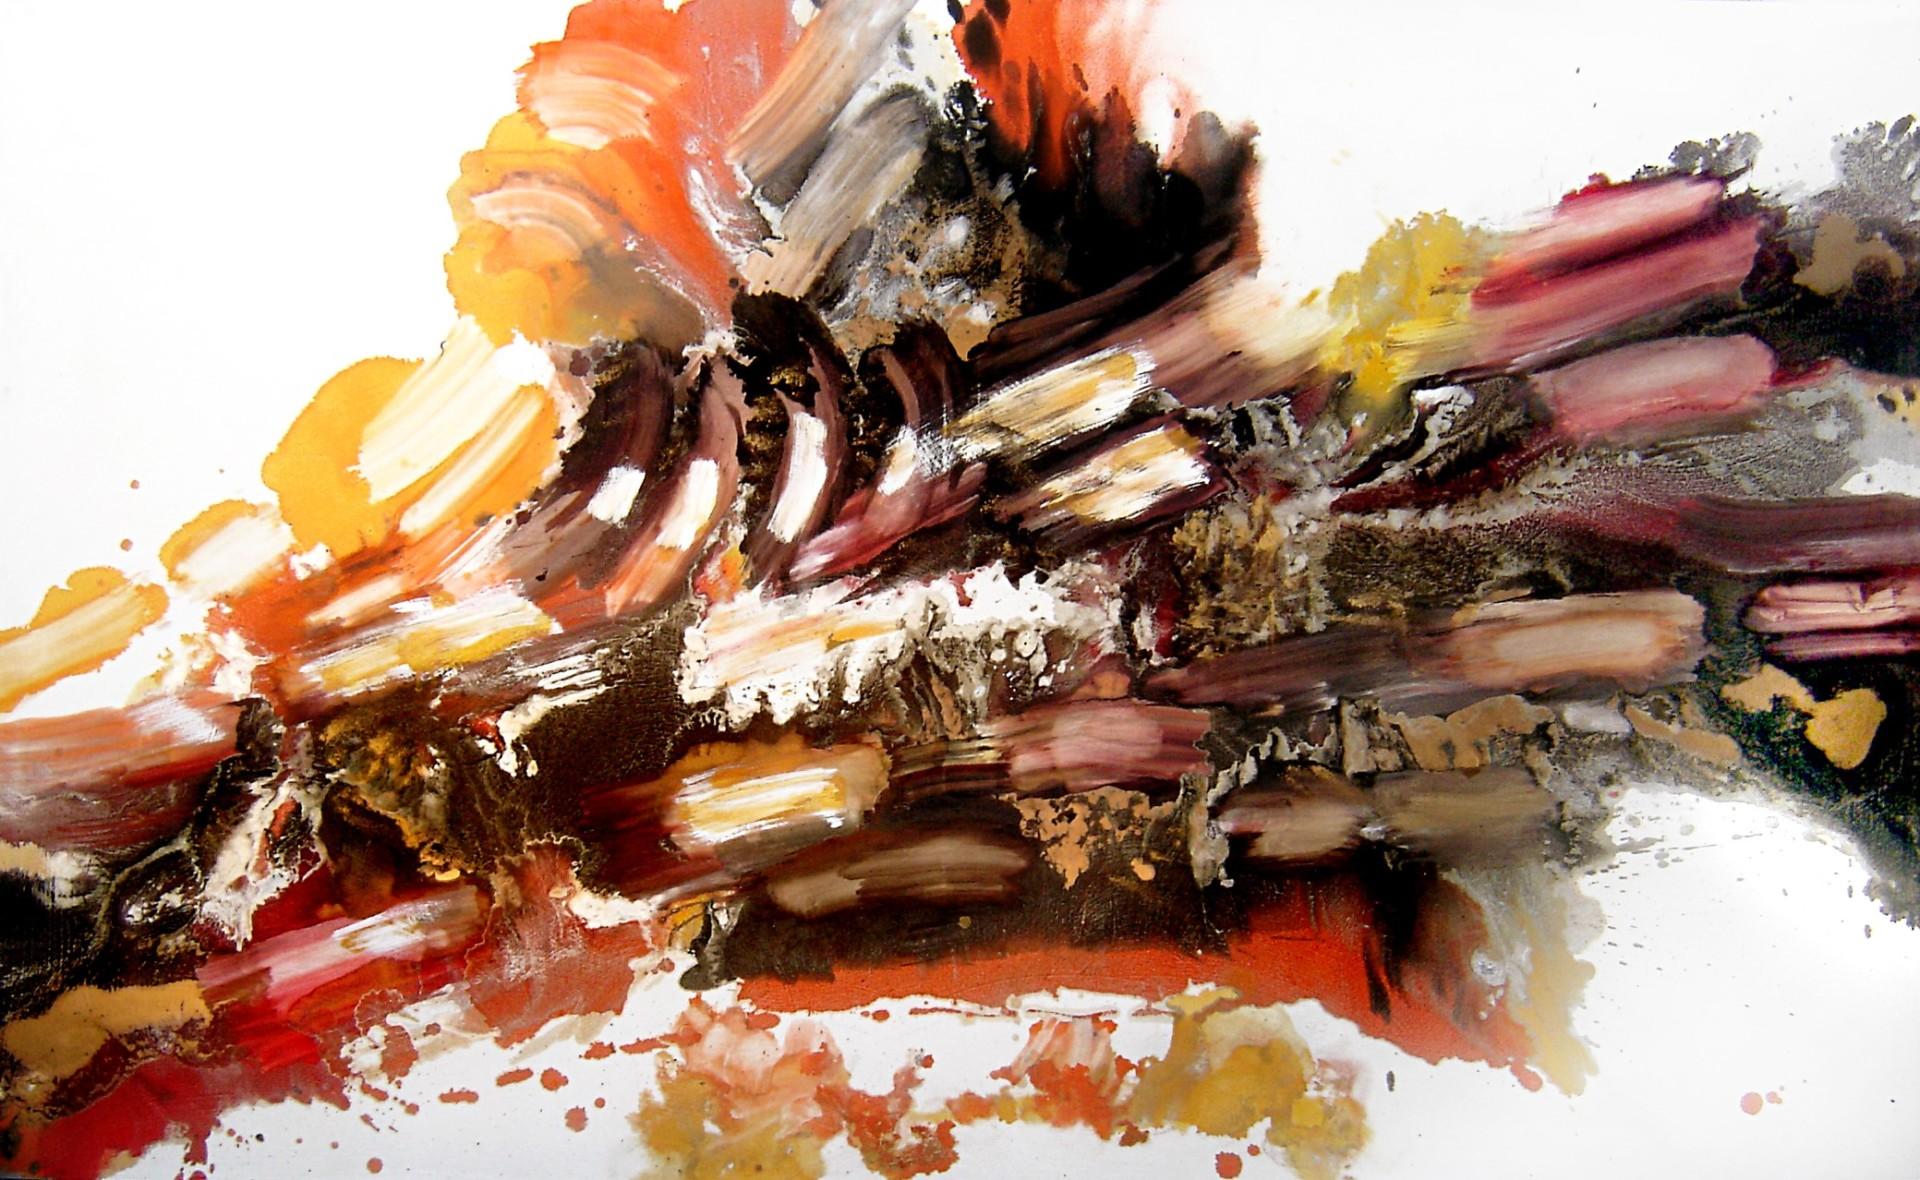 - 130 x 210 - oil on canvas 2017